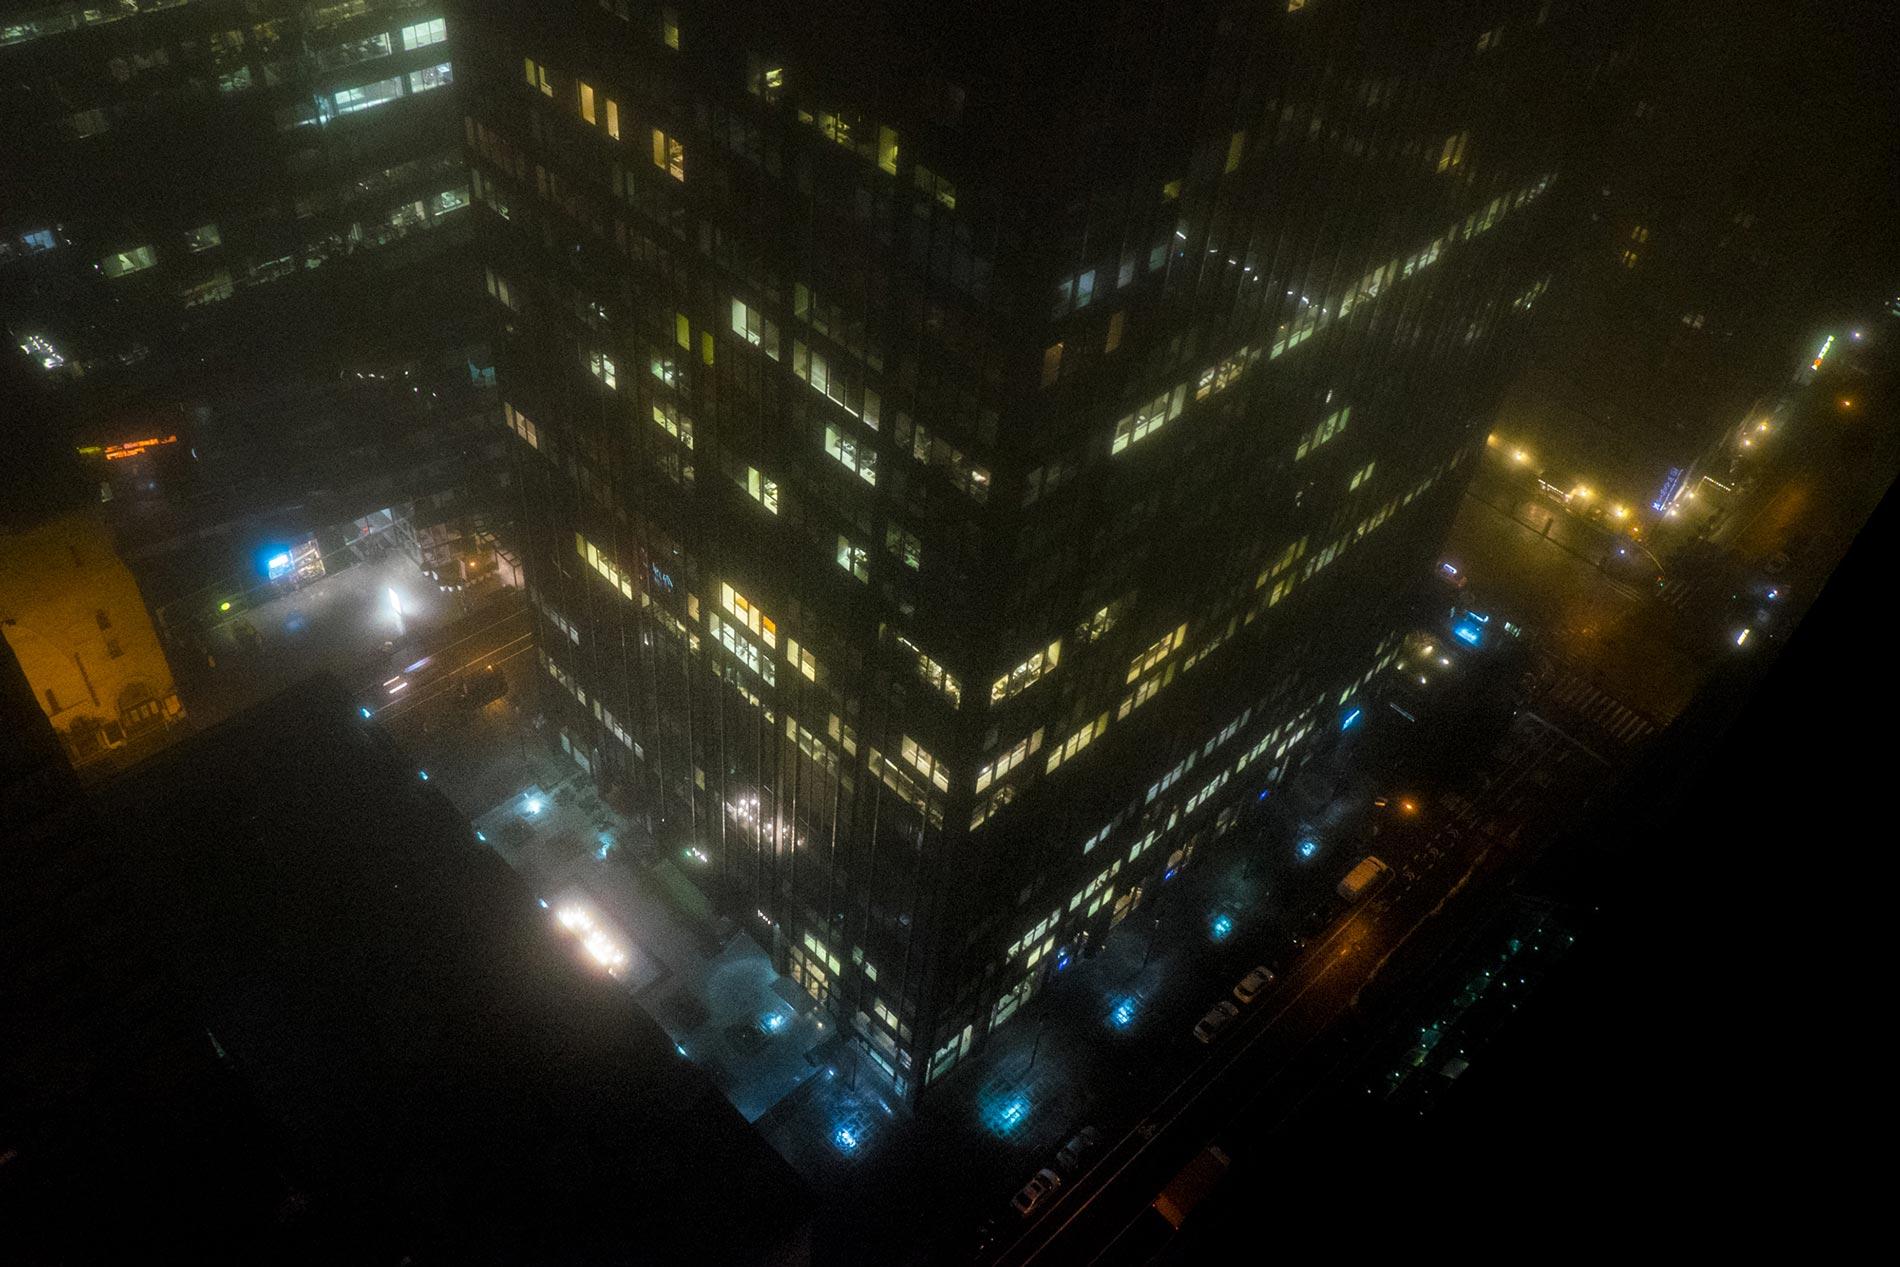 Foggy skyscraper - New York